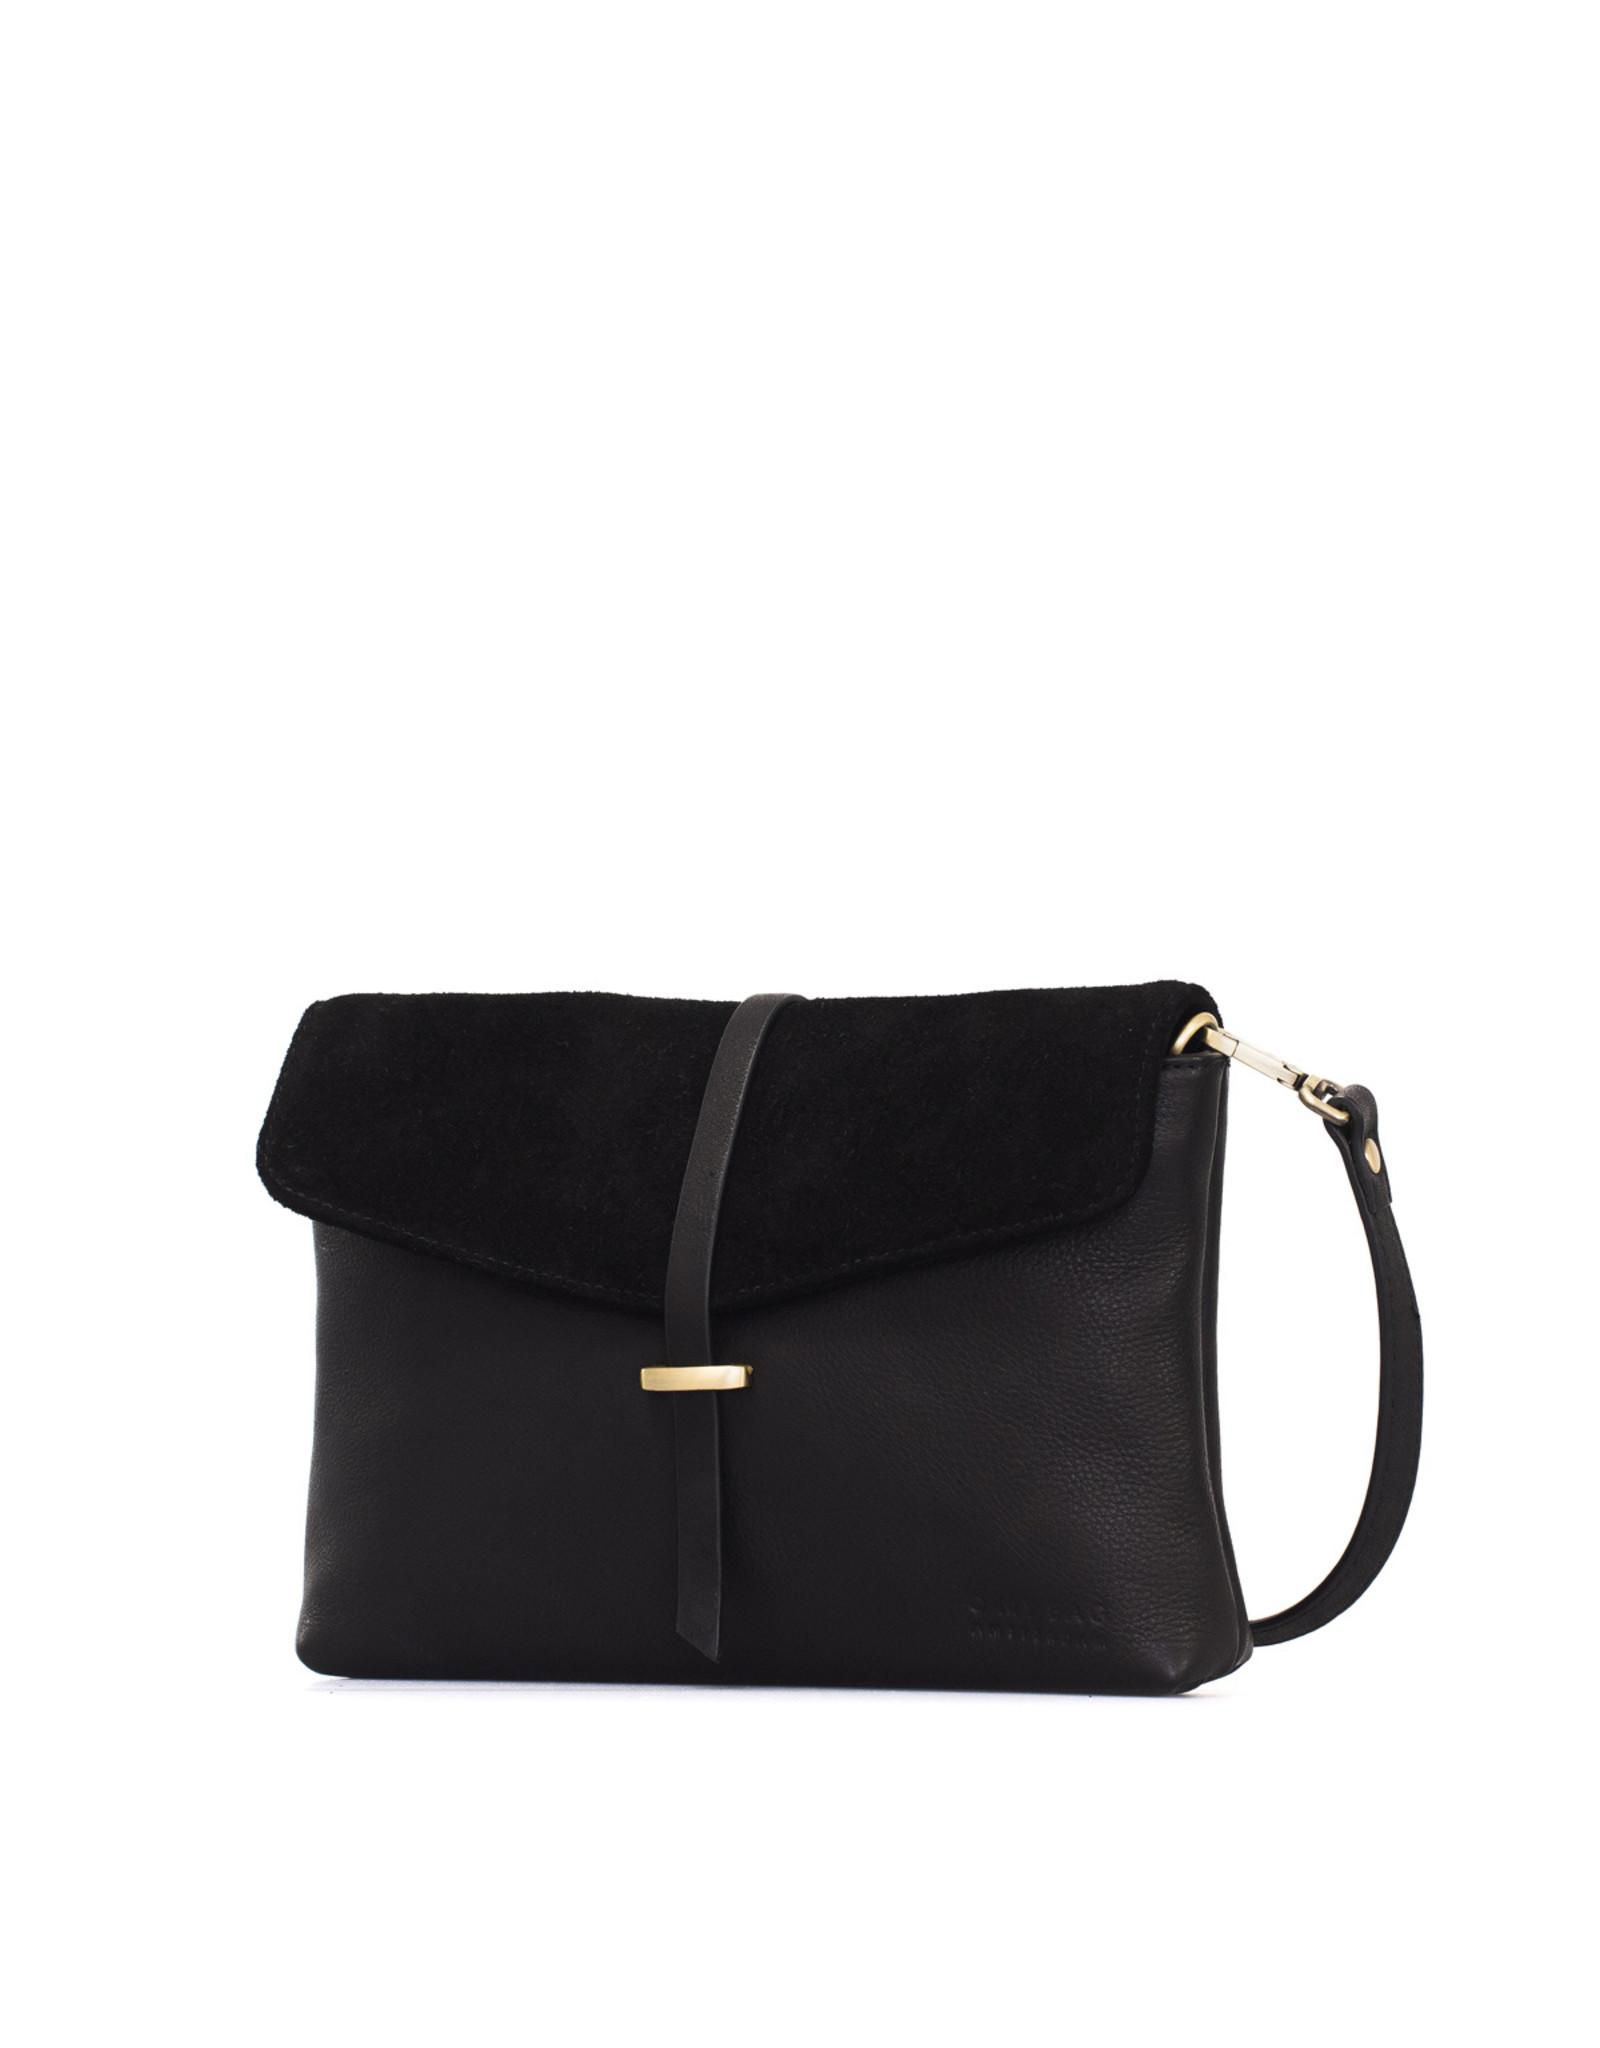 O MY BAG Ella midi bag